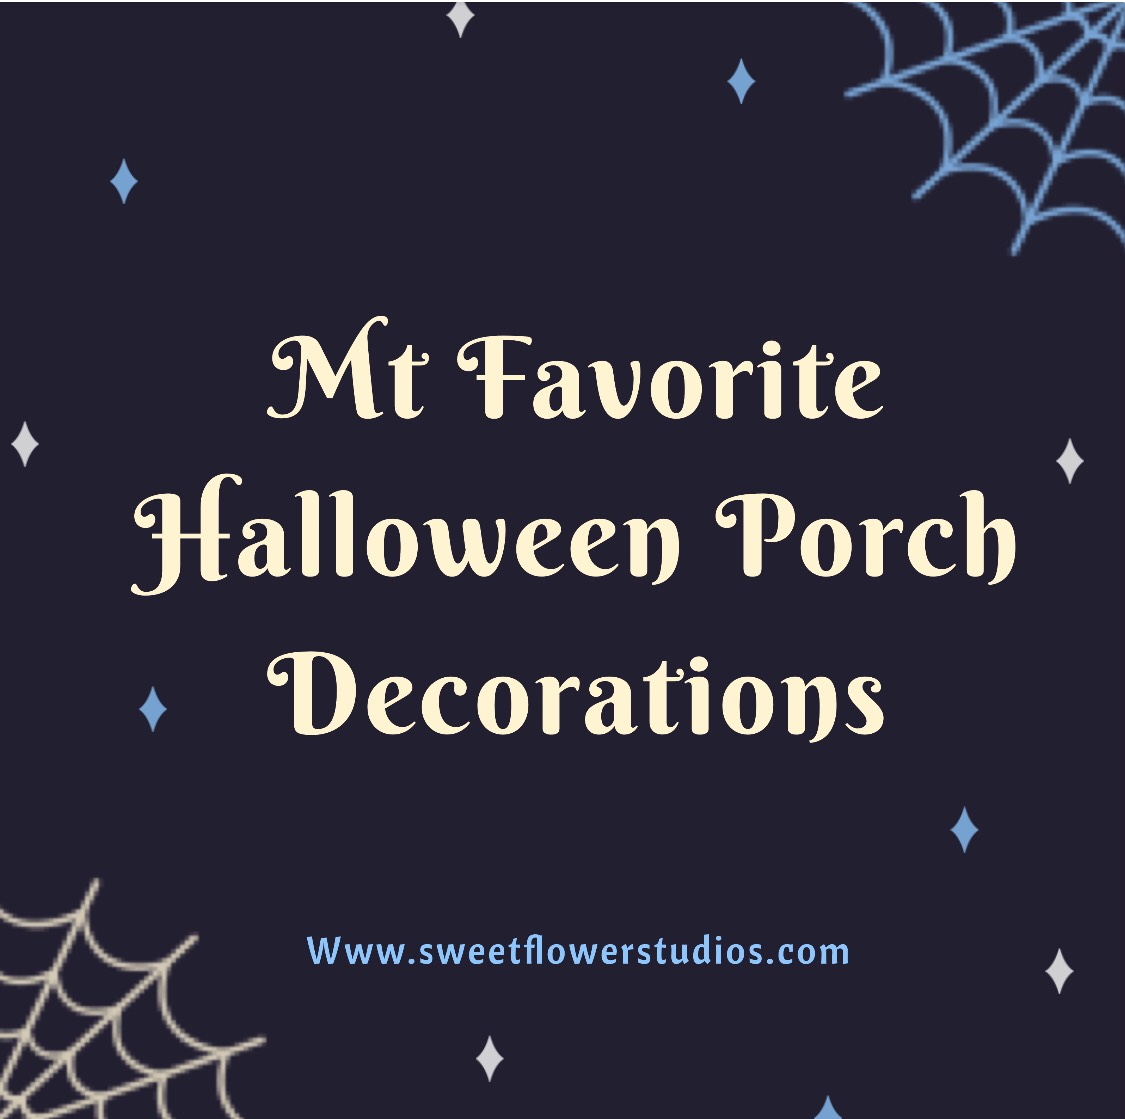 My Favorite Halloween Porch Decorations